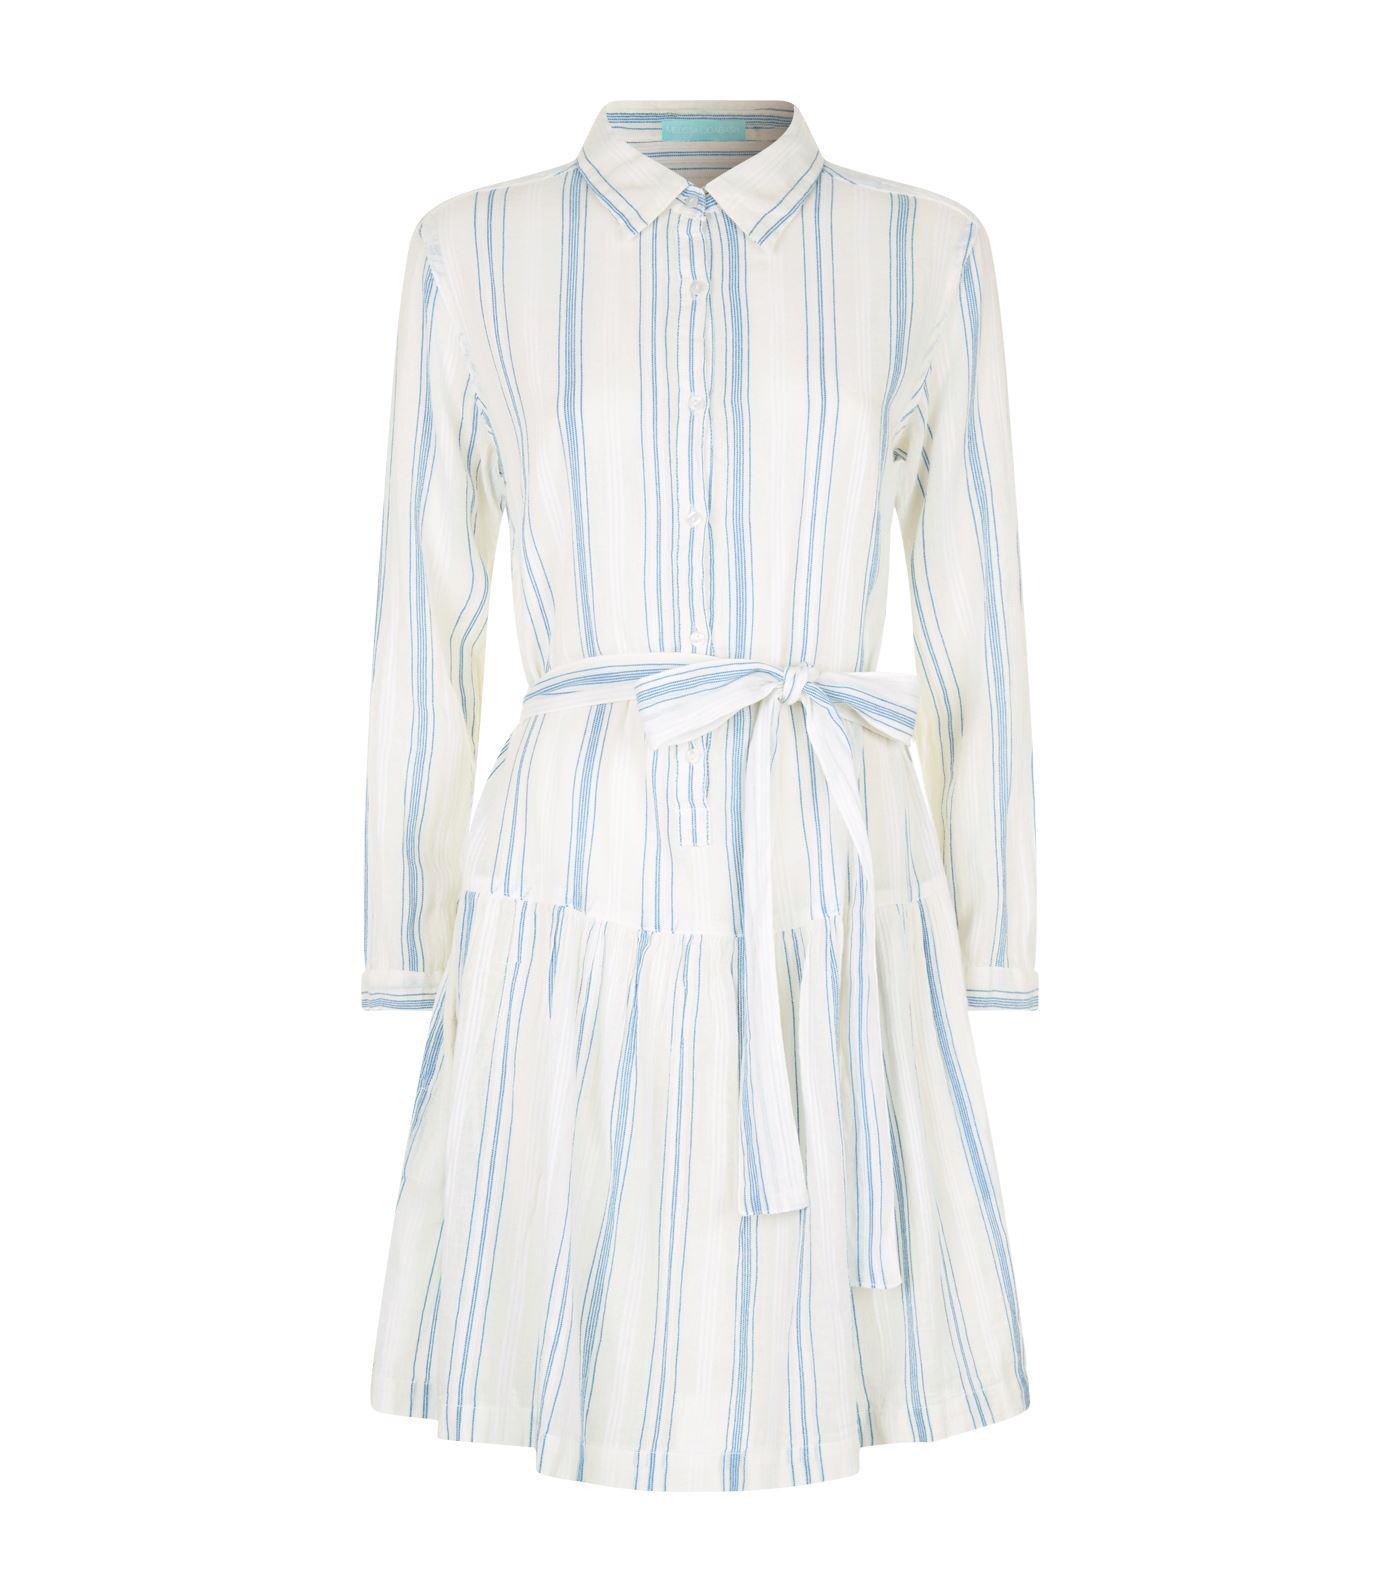 24f3f6b955bf Melissa Odabash Amelia Belted Shirt Dress in Blue - Lyst